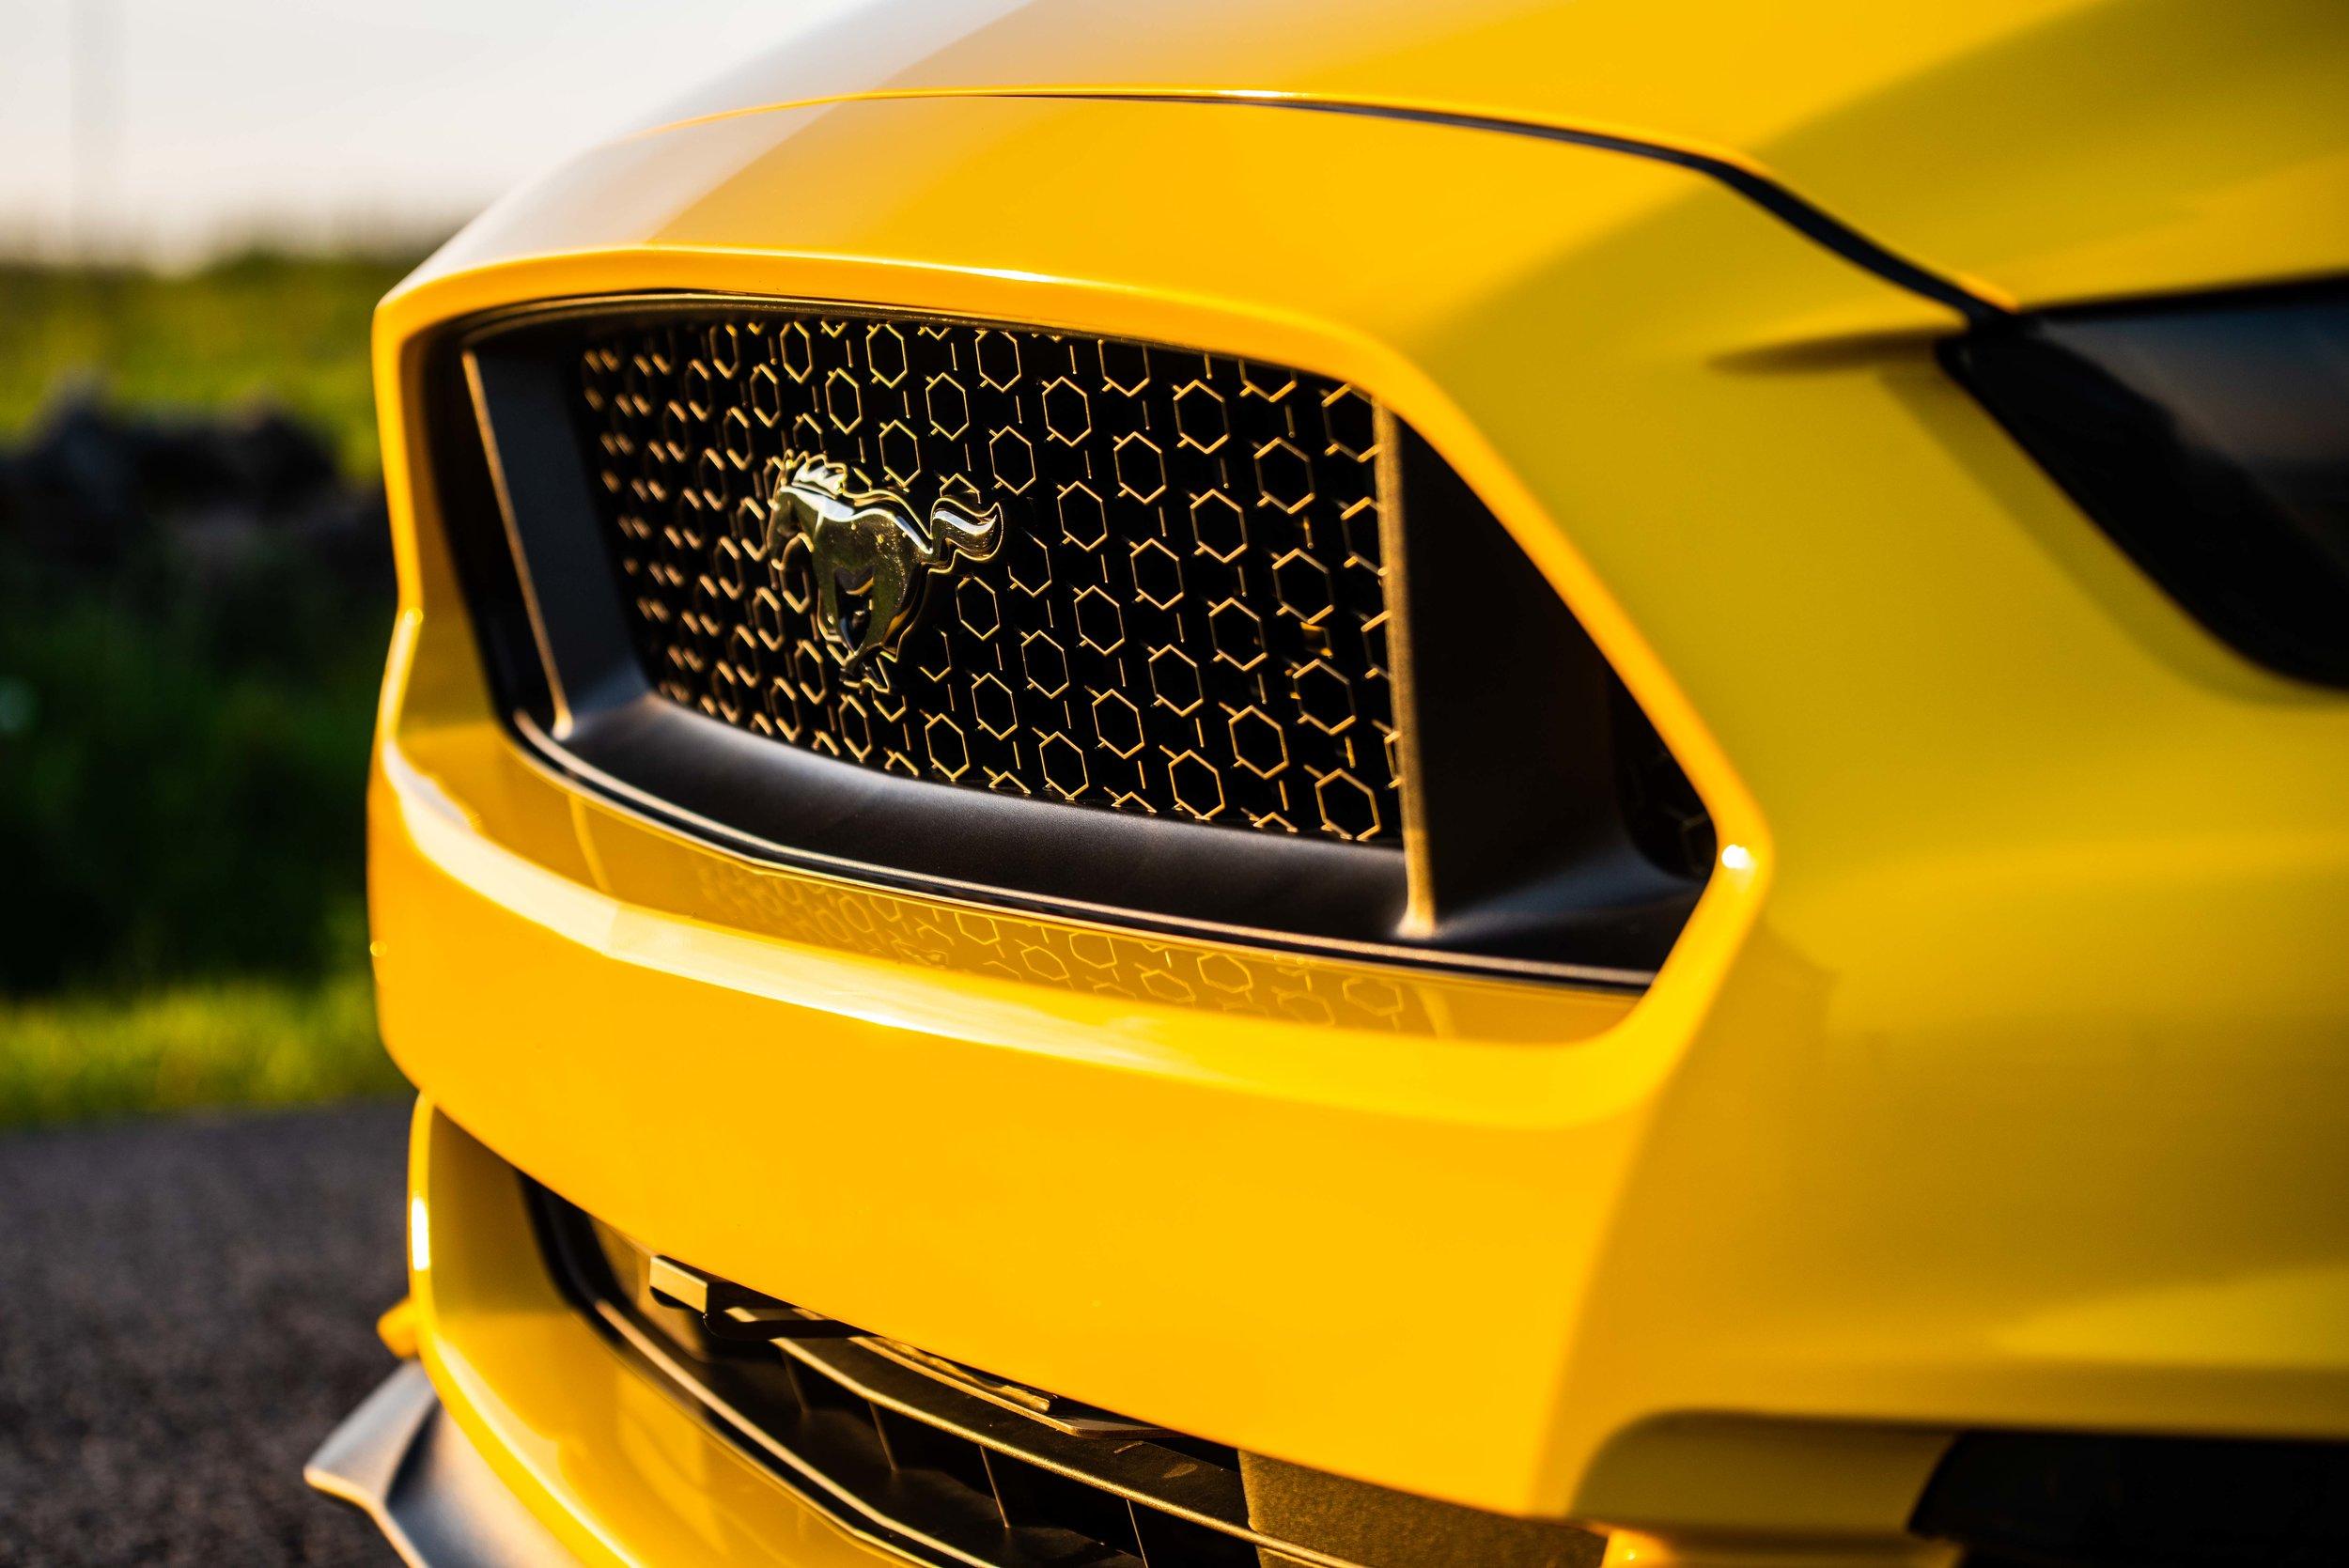 Mustang-12.jpg